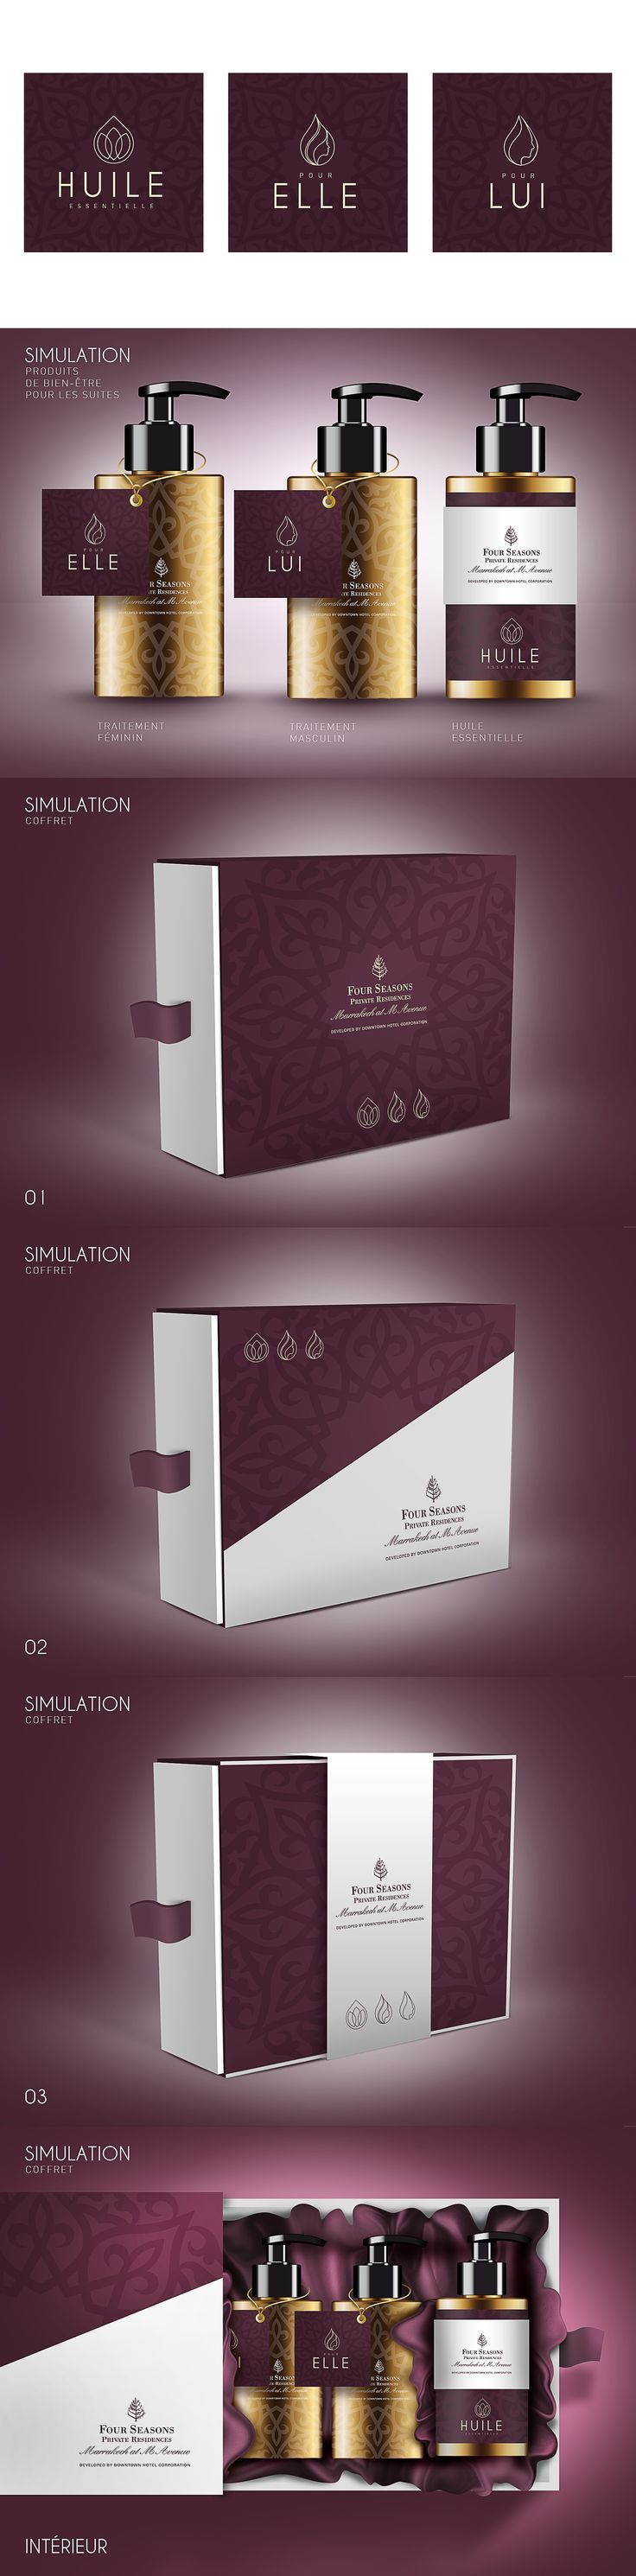 Conception logo & packaging d'huiles essentielles